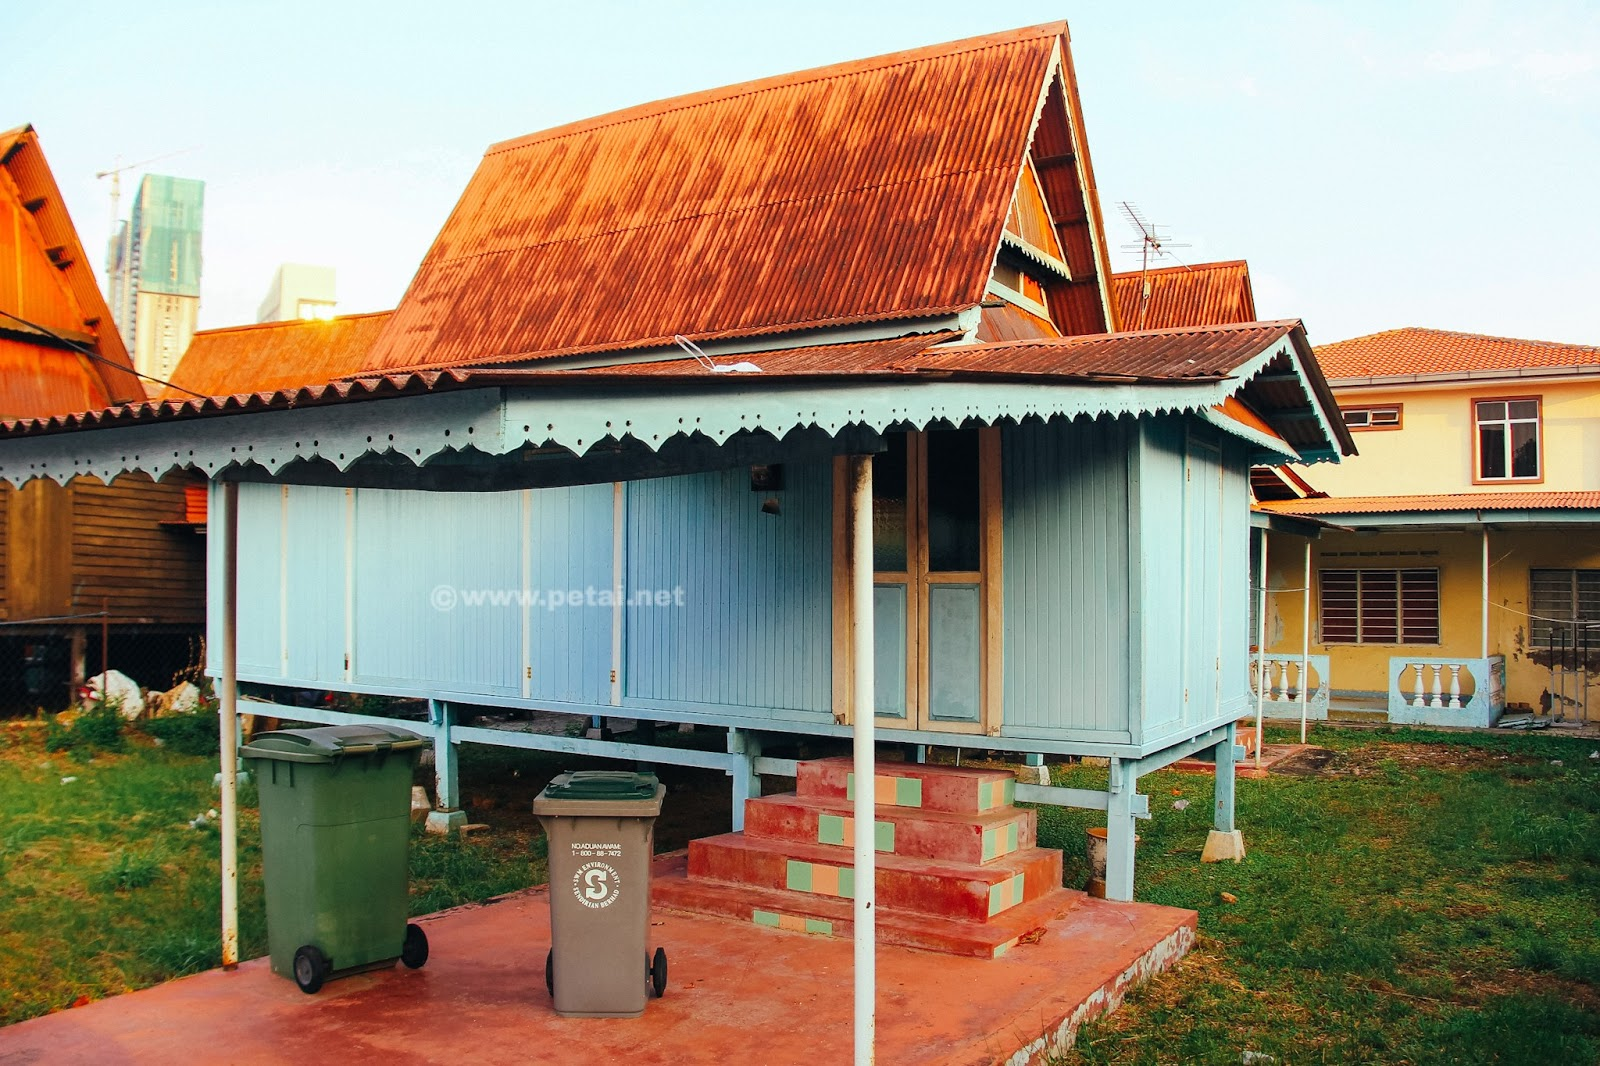 Rumah Melayu Melaka Kampung Morten 3